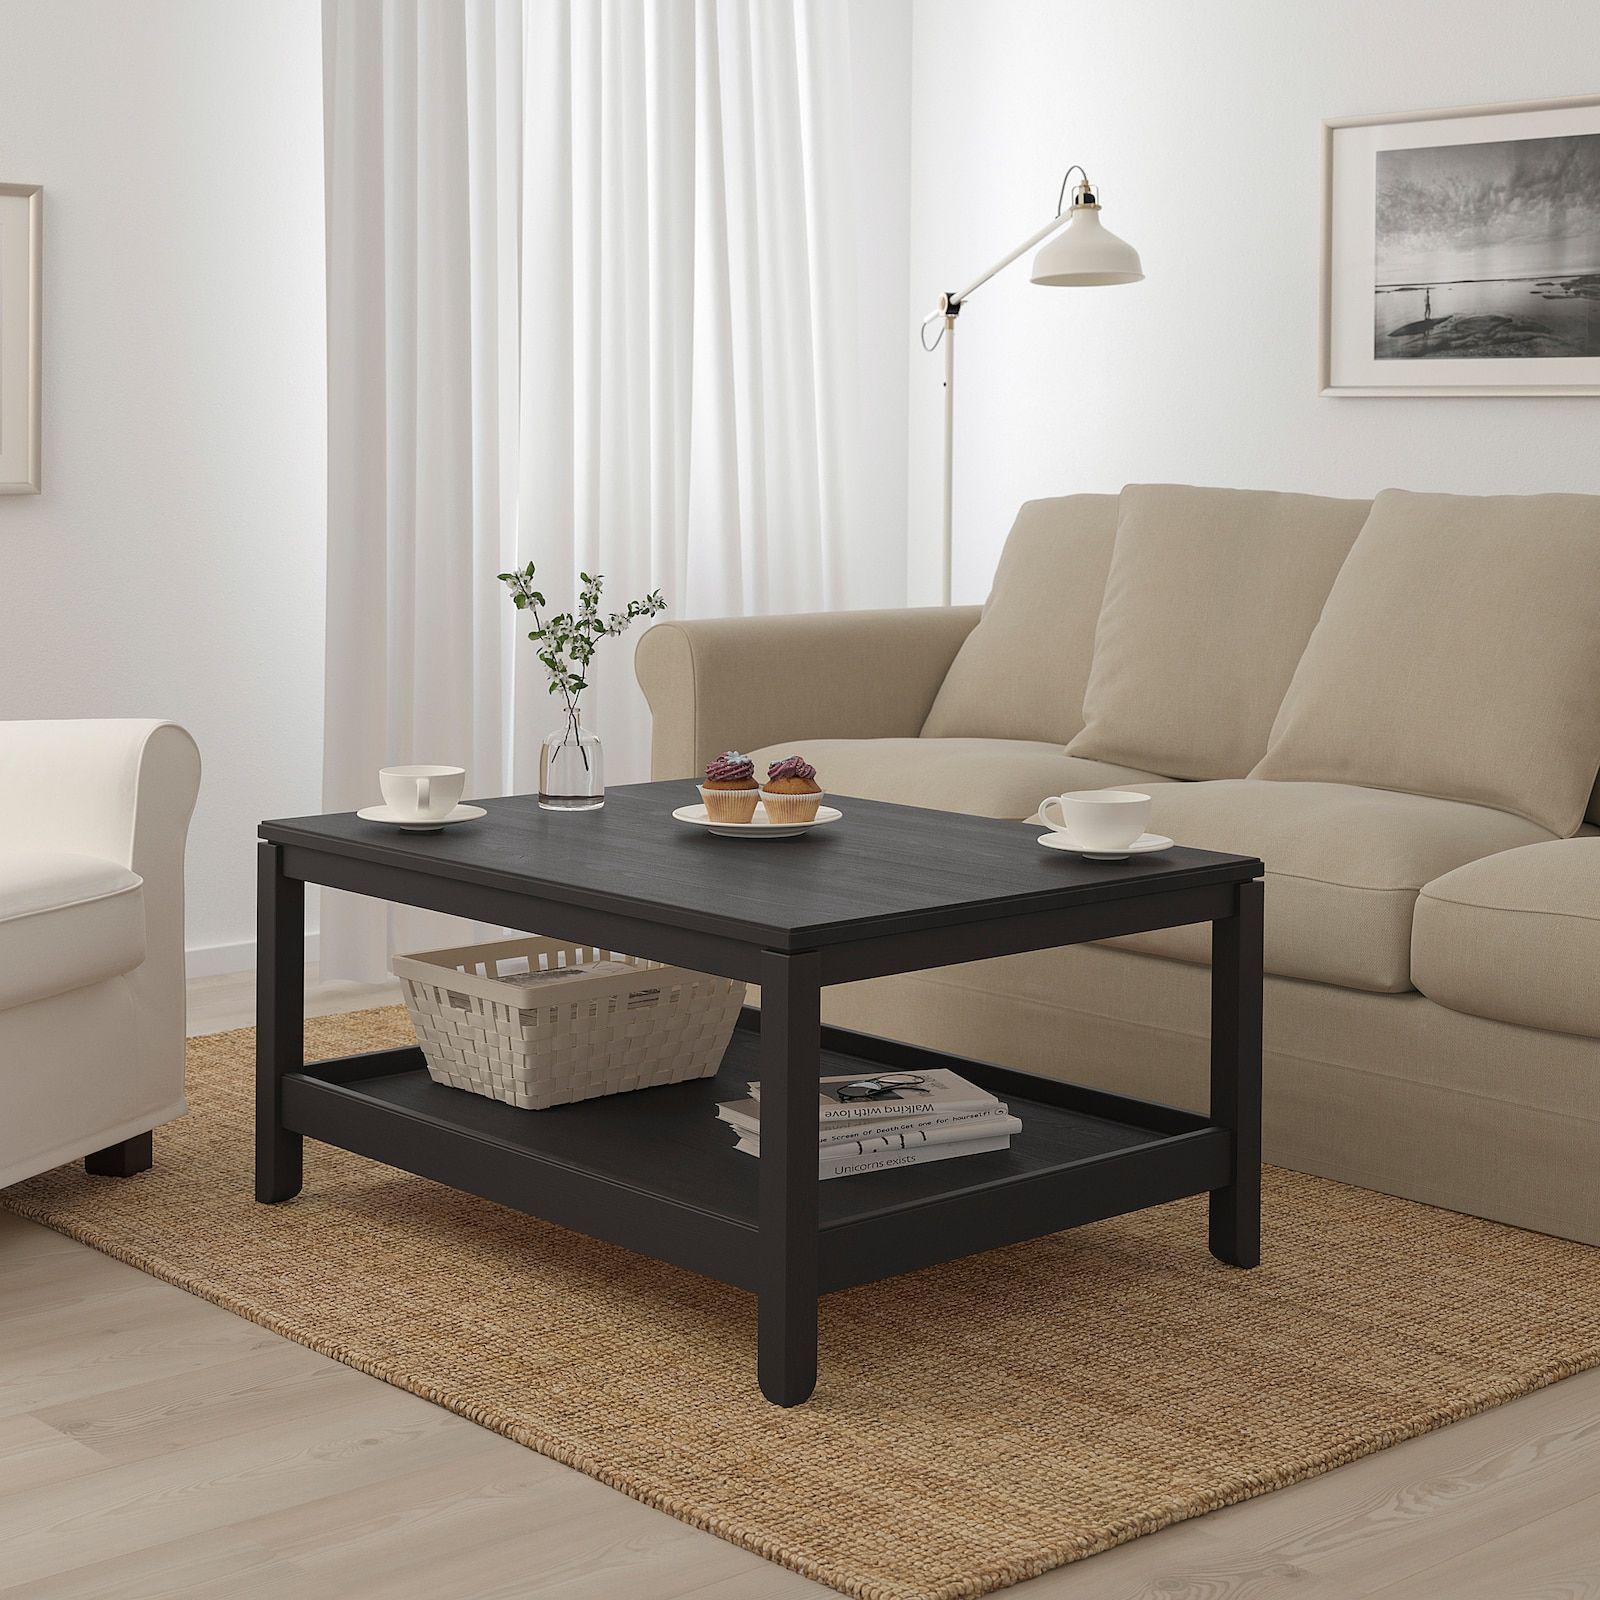 Havsta Coffee Table Dark Brown 100x75 Cm Ikea Coastal Living Room Coffee Table Furniture [ 1600 x 1600 Pixel ]